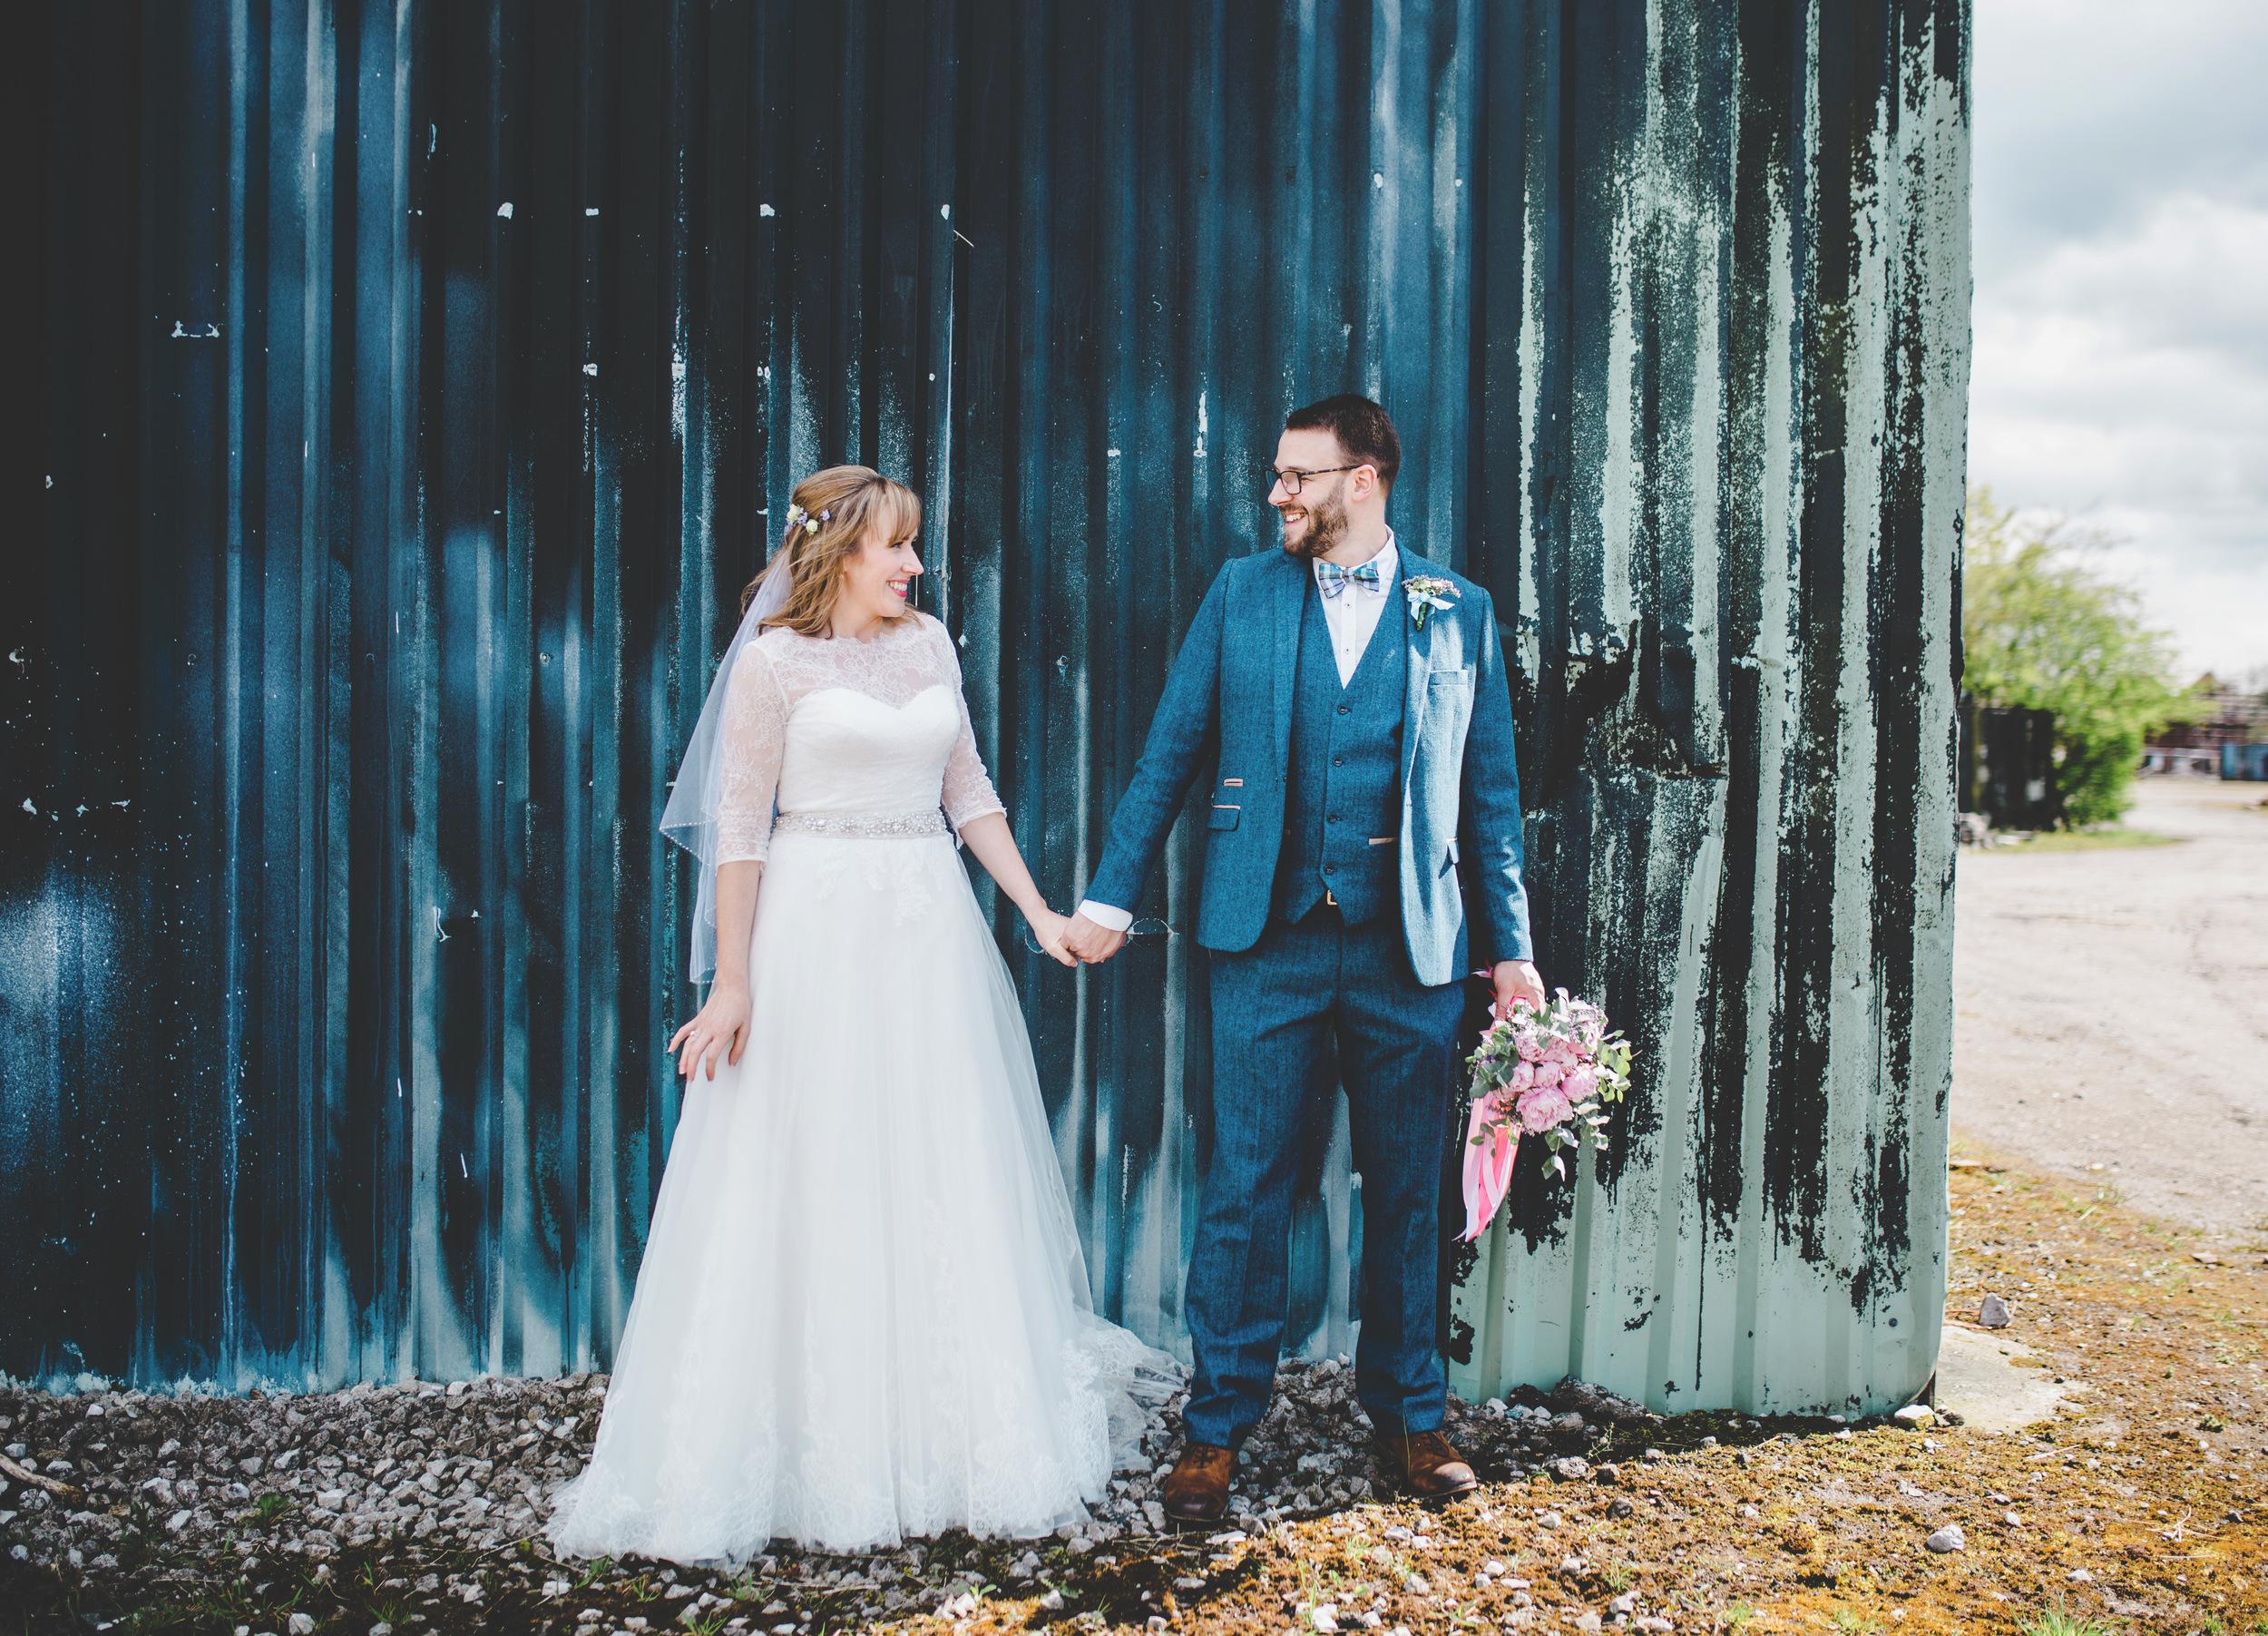 Fantastic Wedding Dress Hire Cheshire Collection - Wedding Dress ...